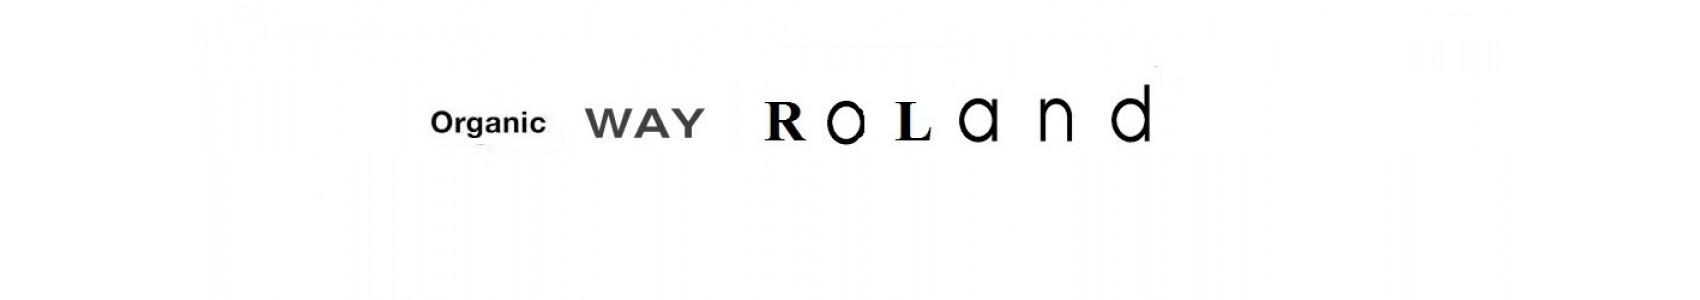 Organic Way RoLand